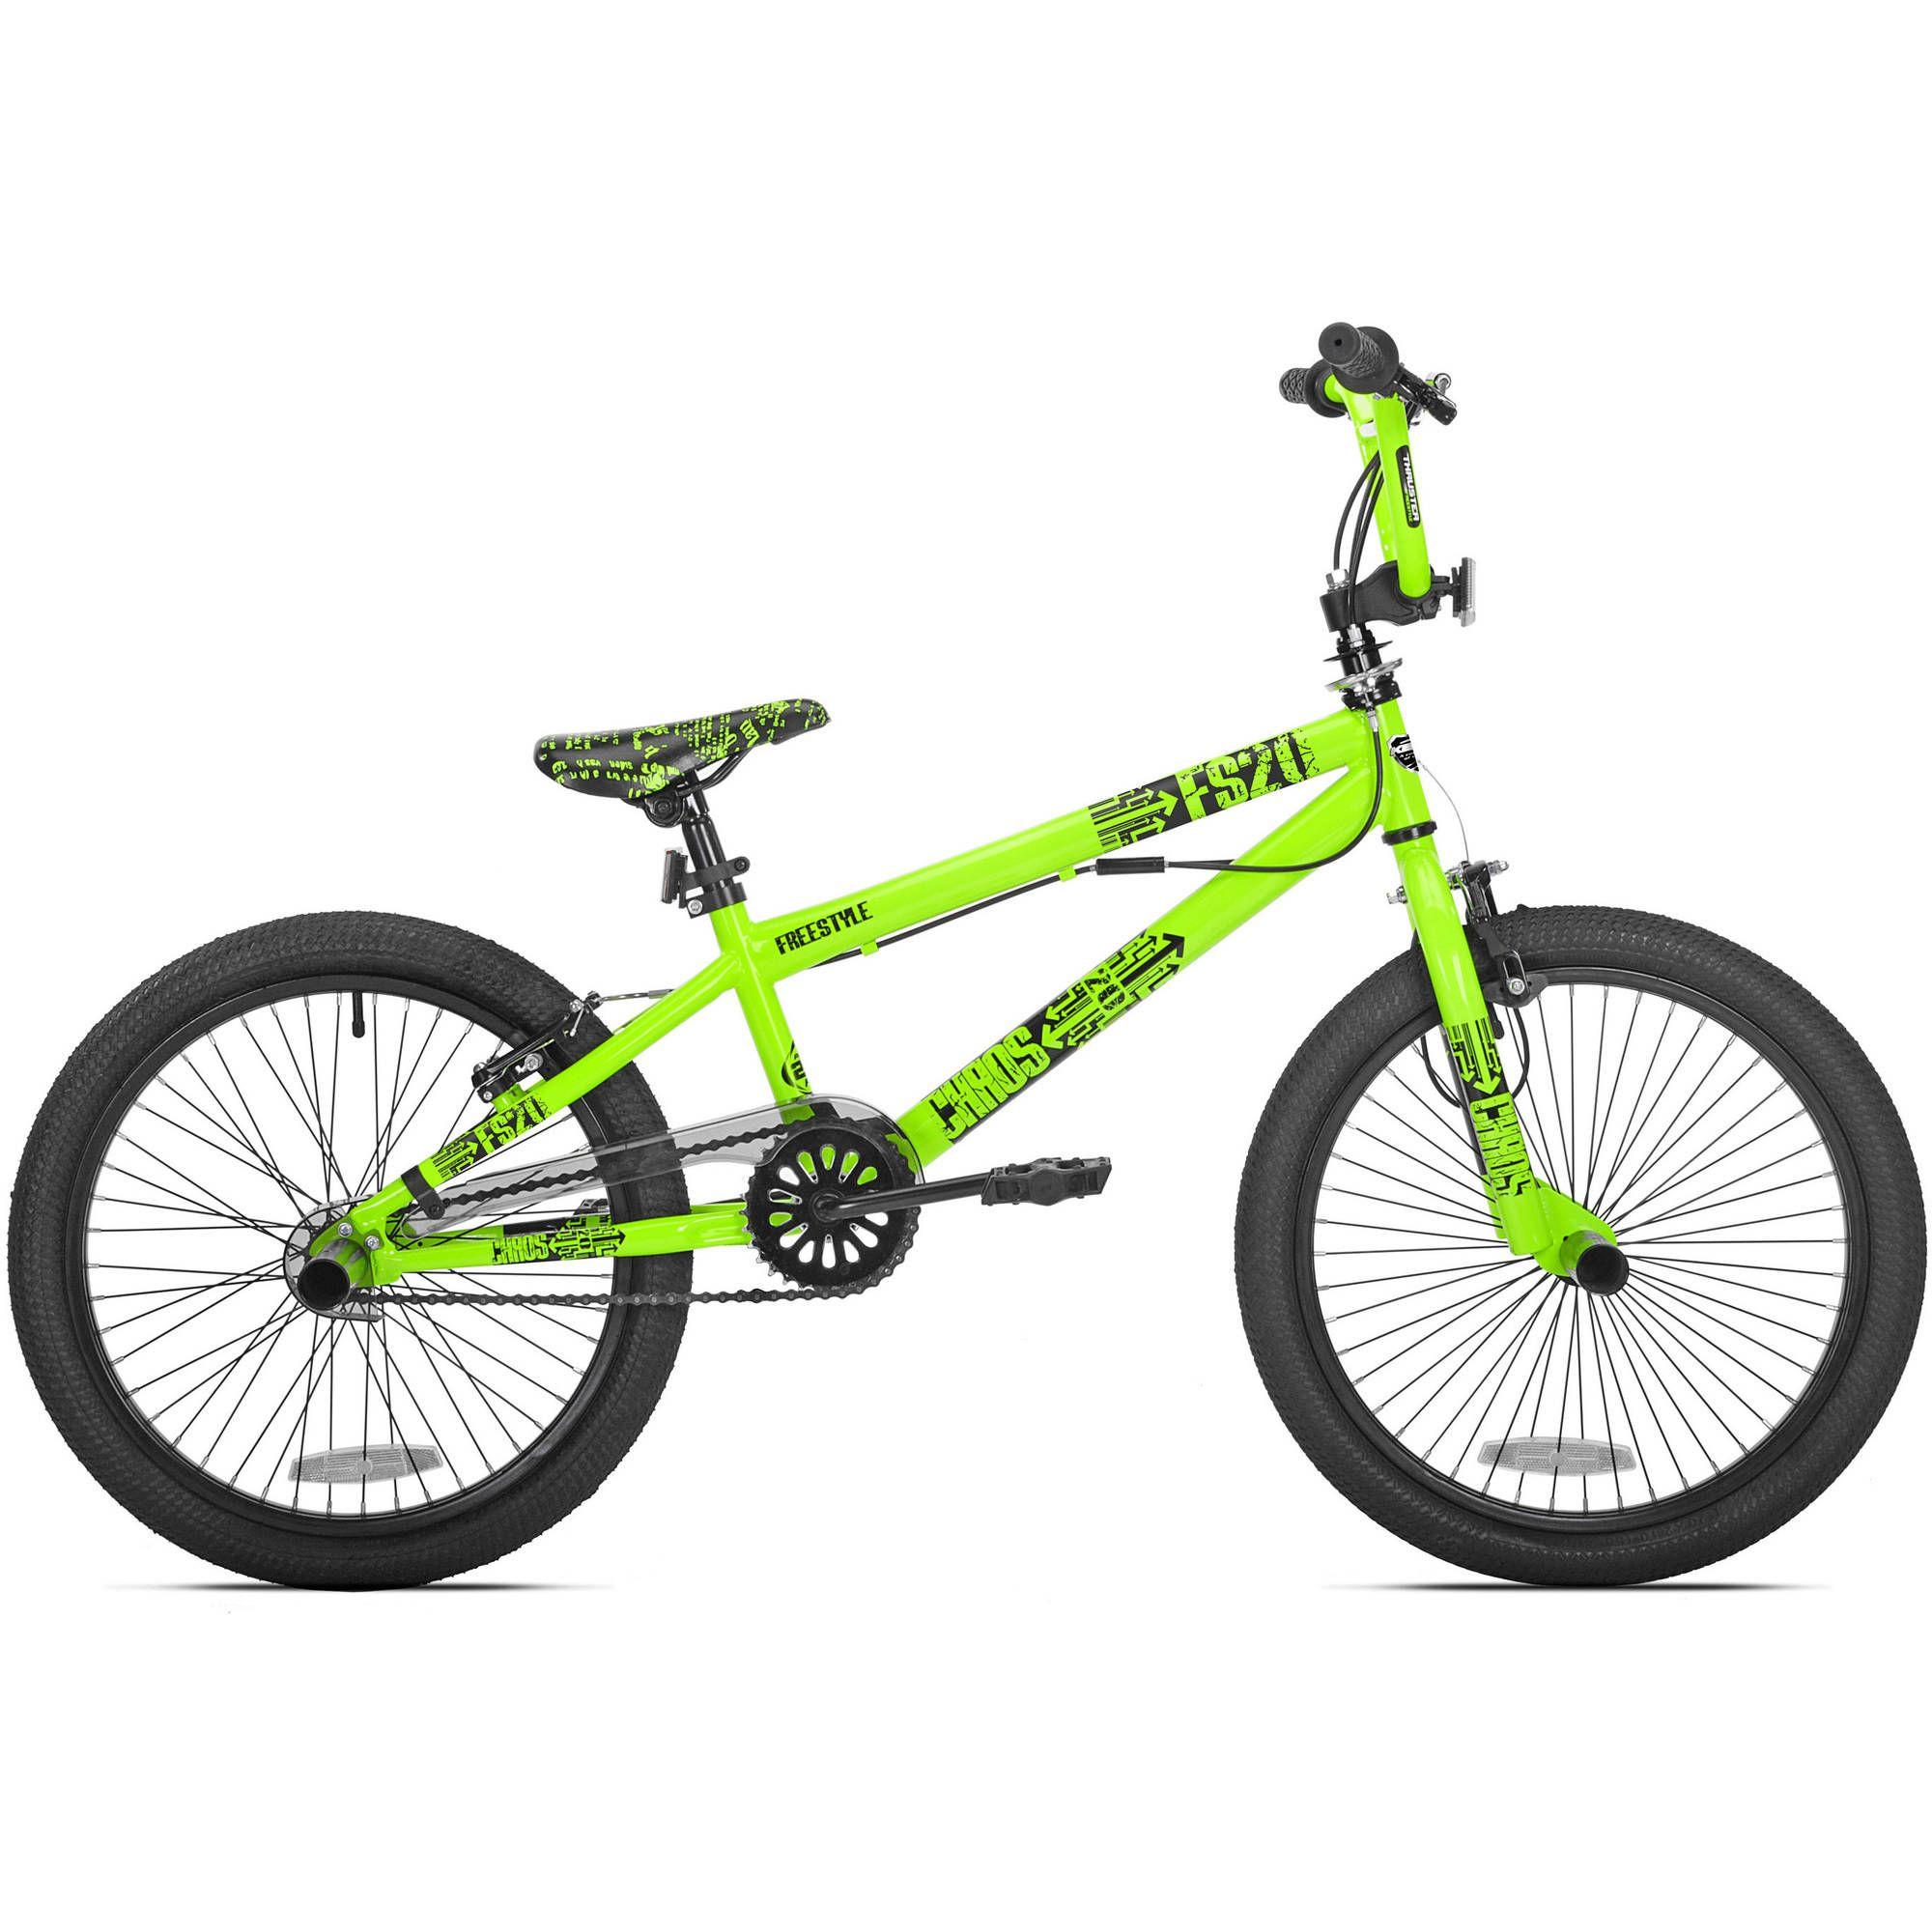 Sports Outdoors Bike Freestyle Bmx Bmx Bikes